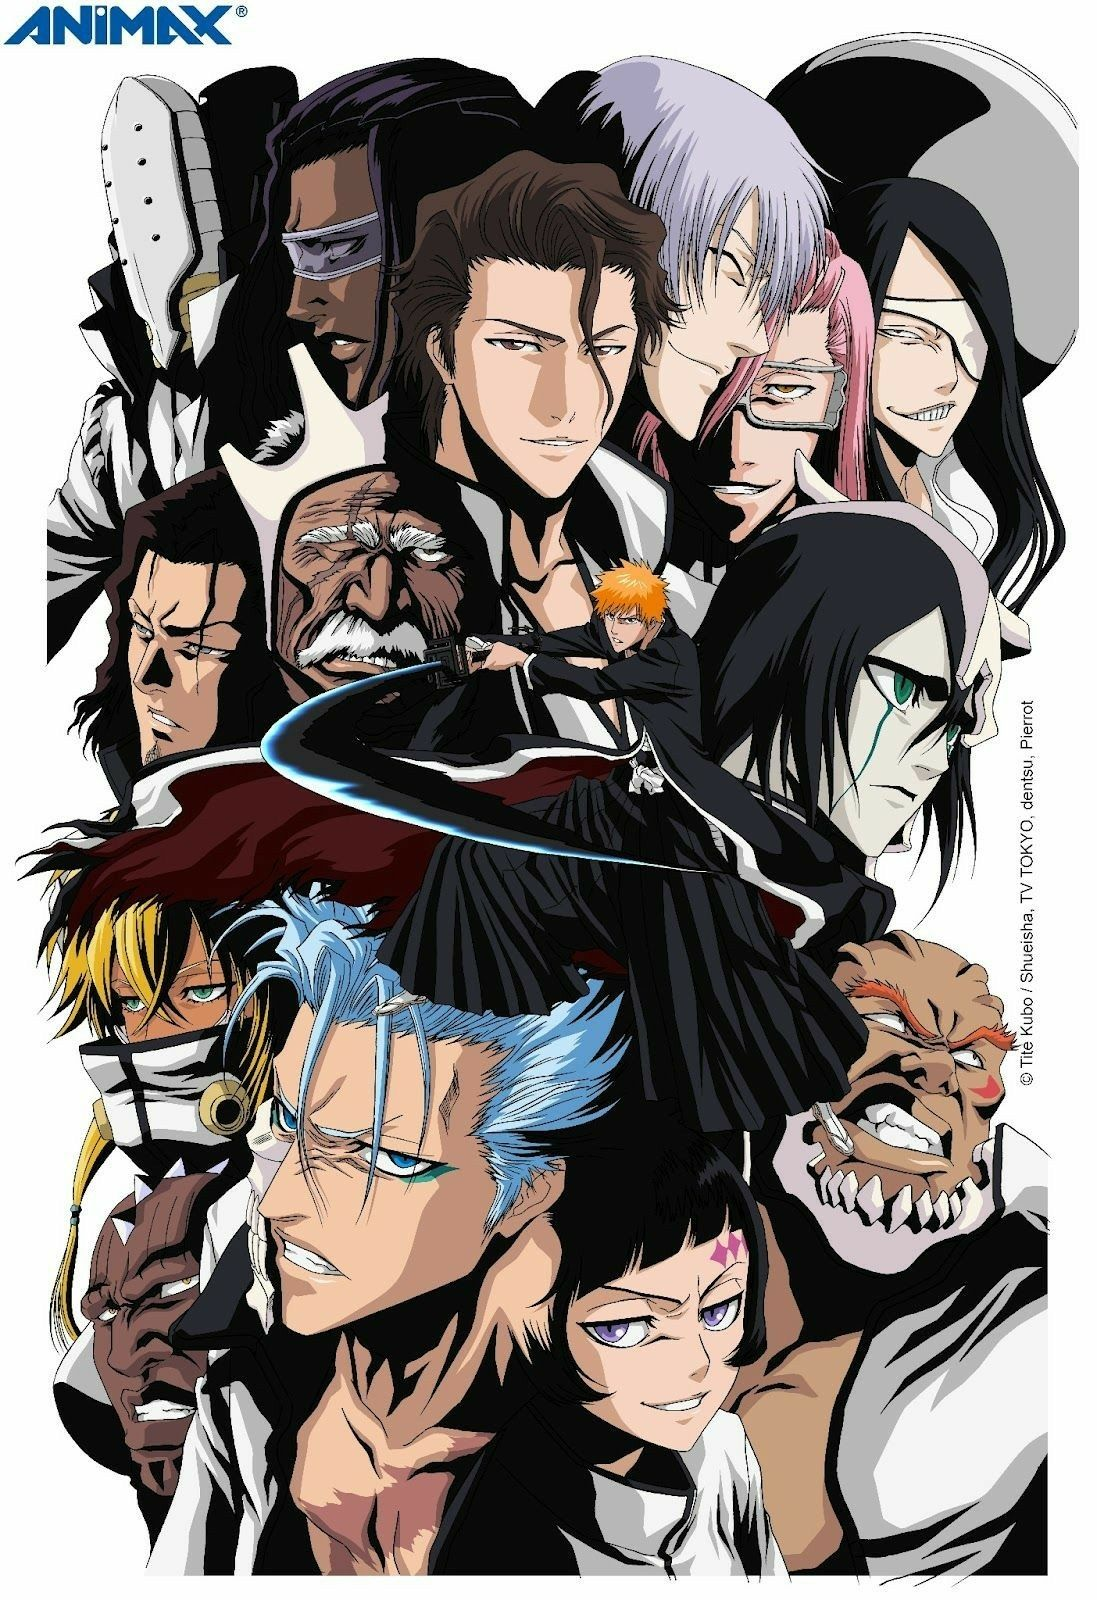 Pin by Siddharth Singh on anime Bleach anime, Anime